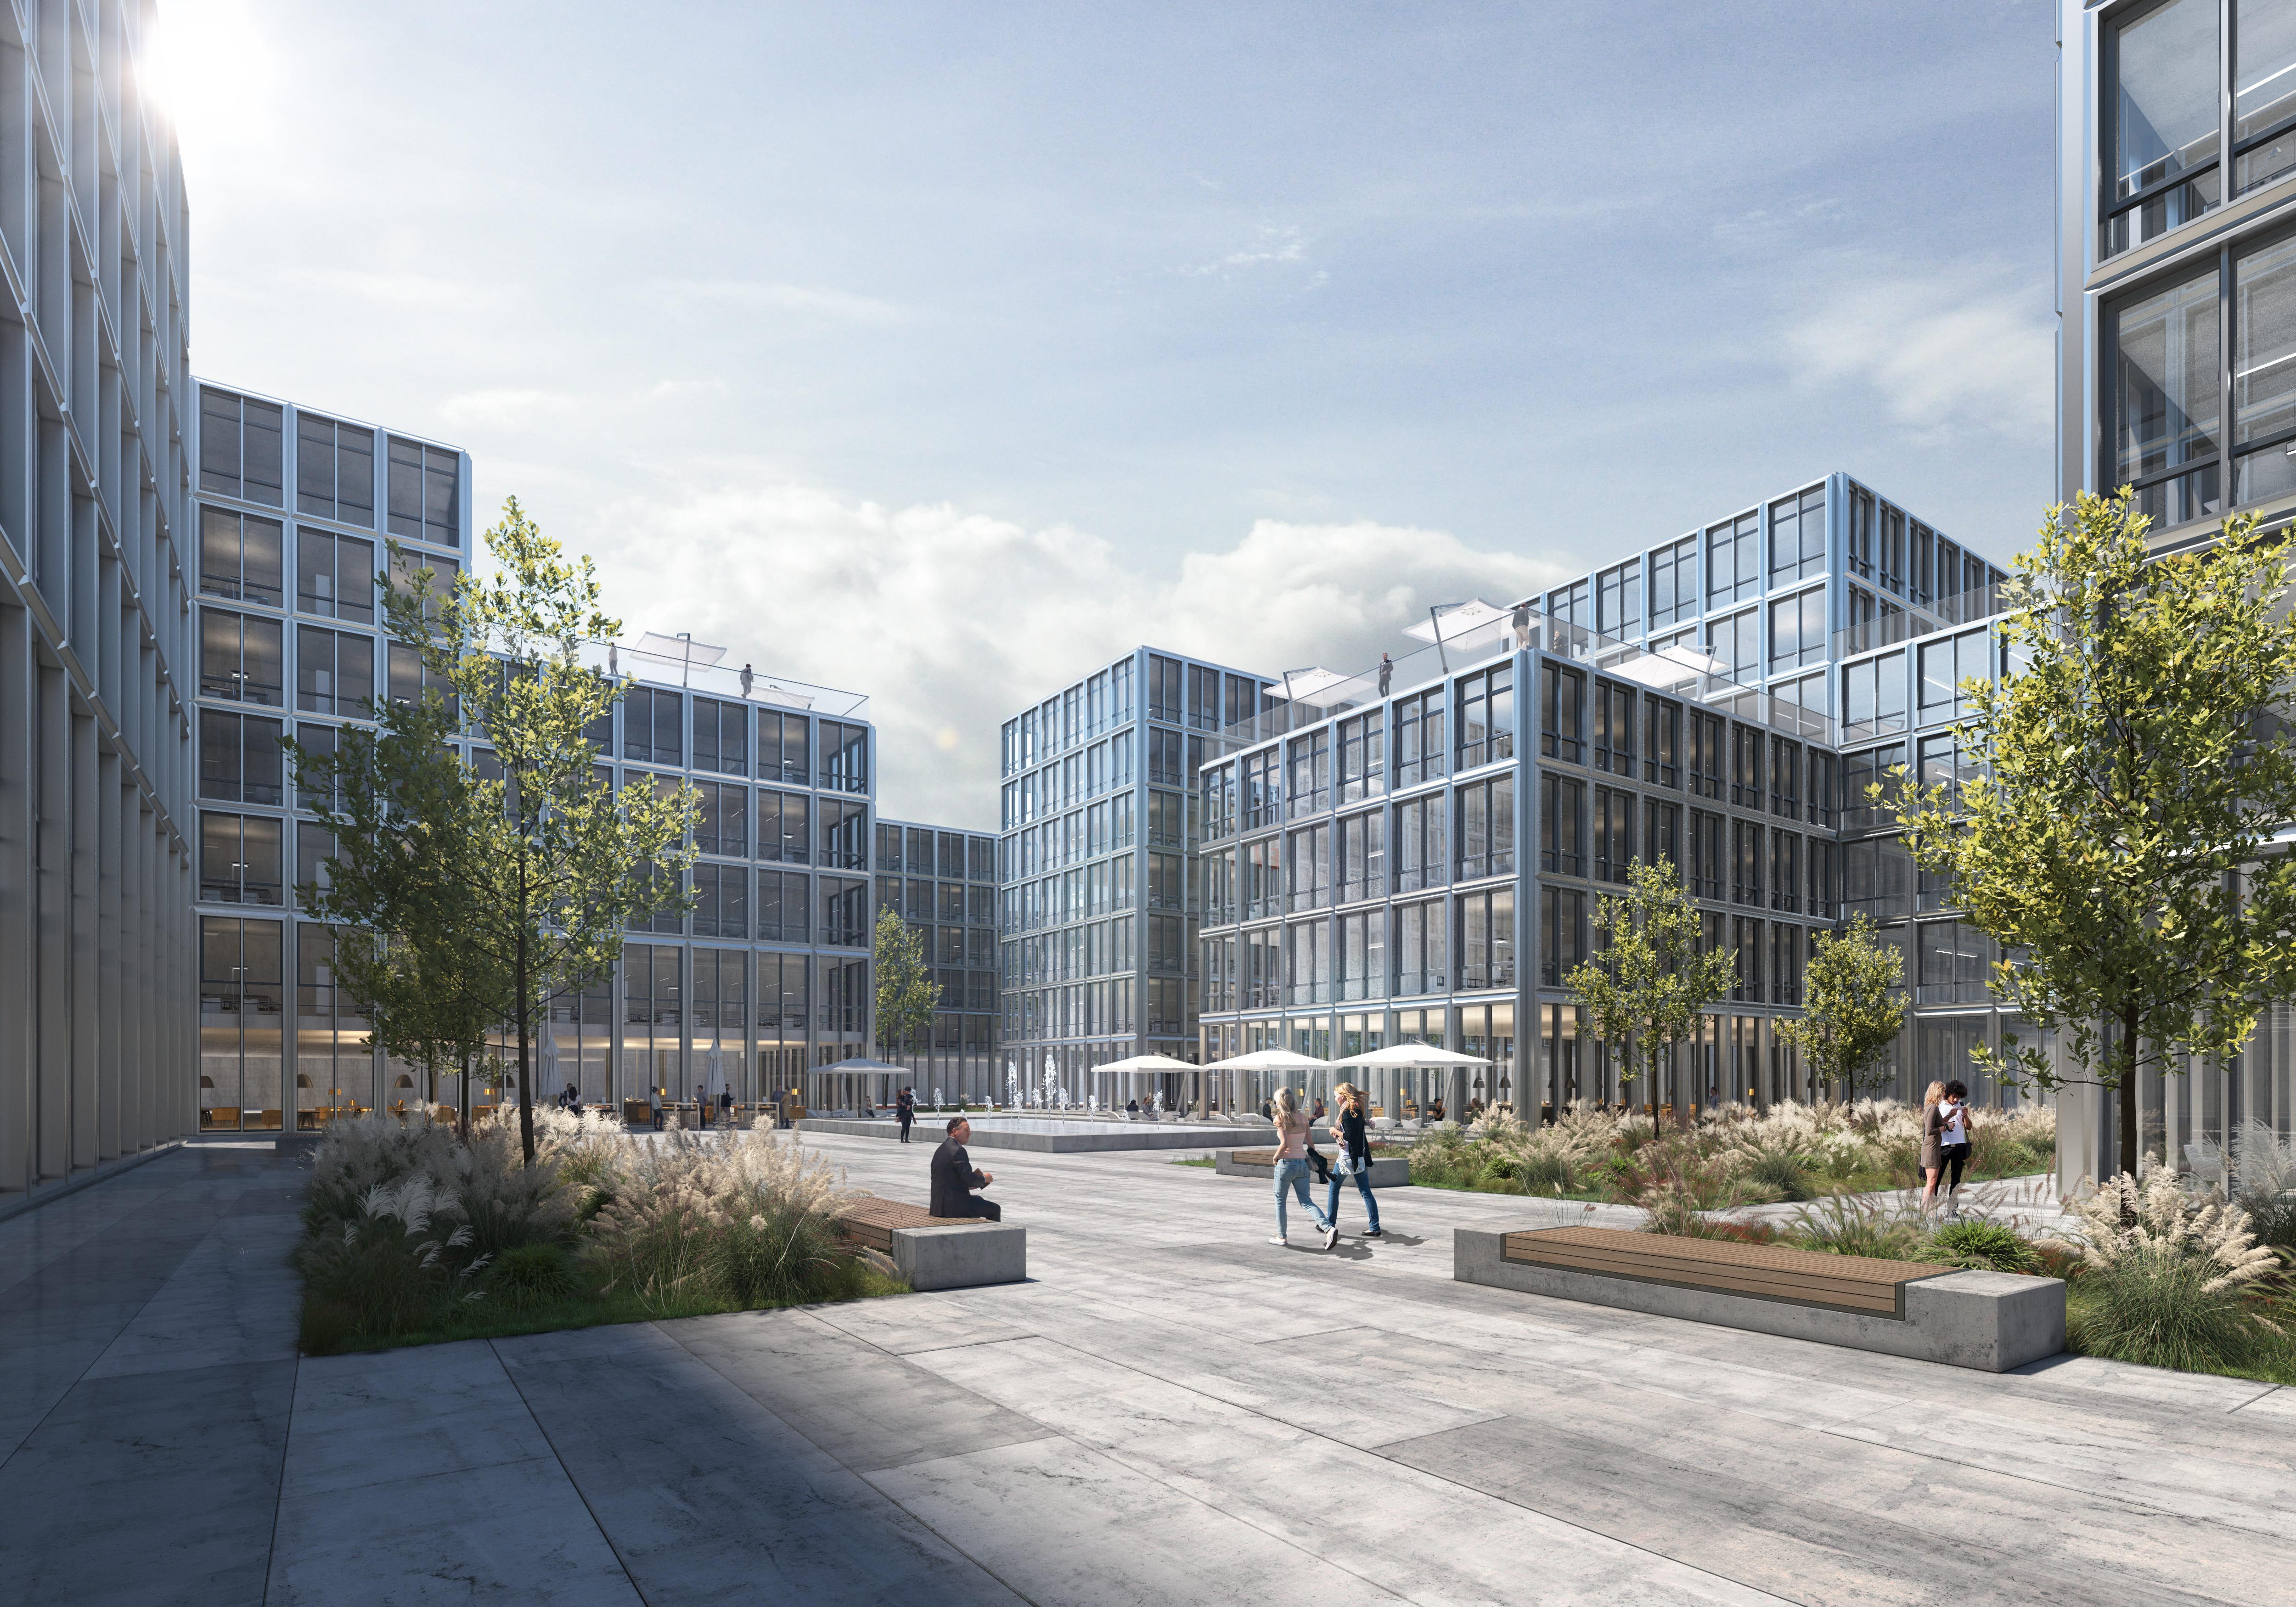 Positiver Bauvorbescheid für großes Büro-Projekt in Köln